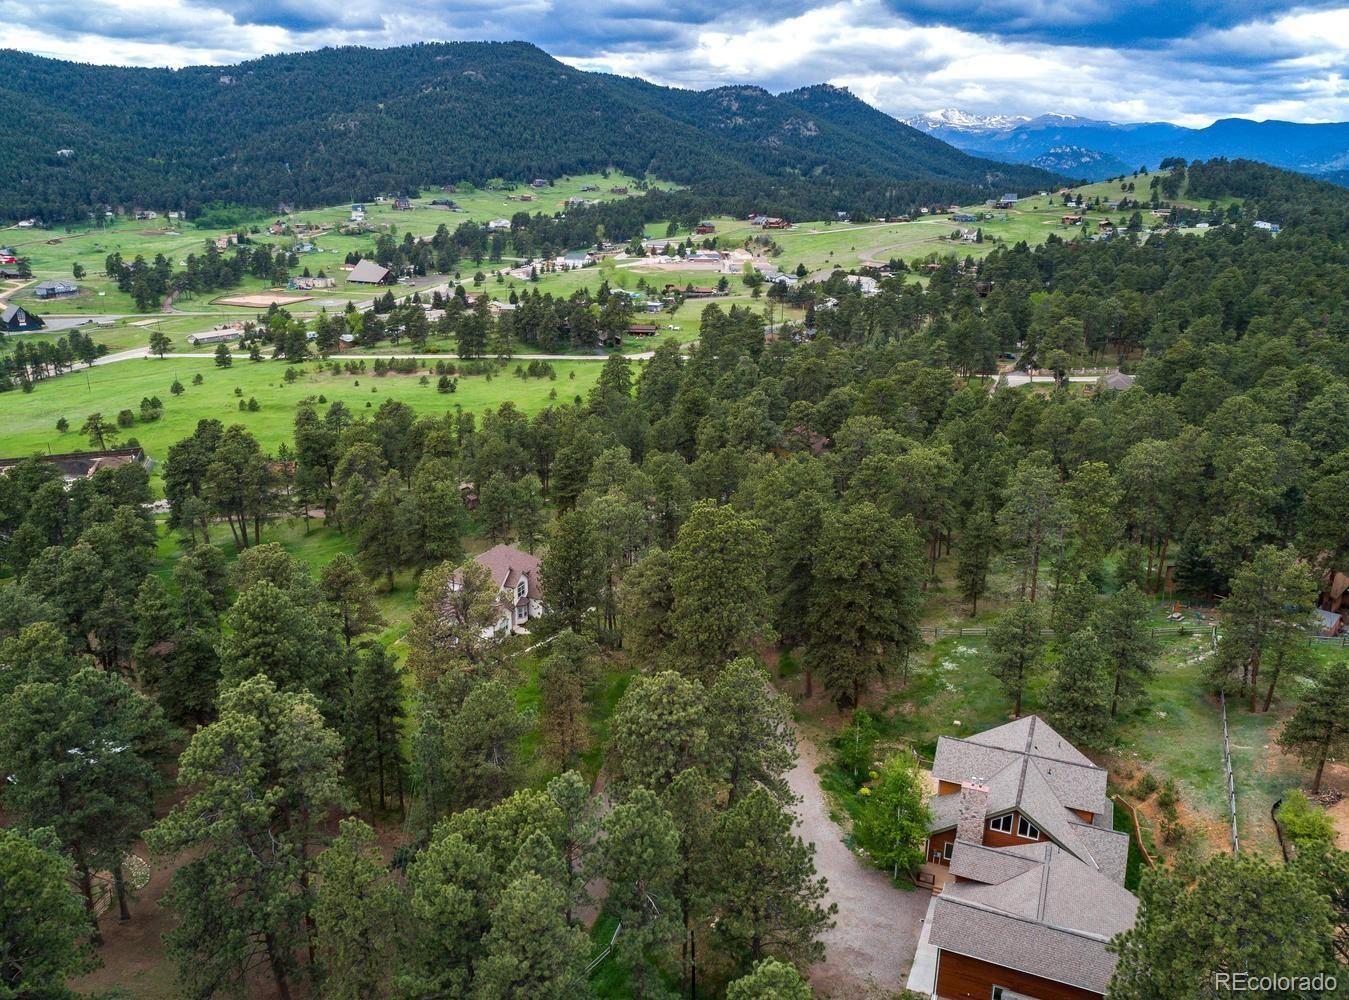 MLS# 5993461 - 39 - 23111 Shoshone Road, Indian Hills, CO 80454